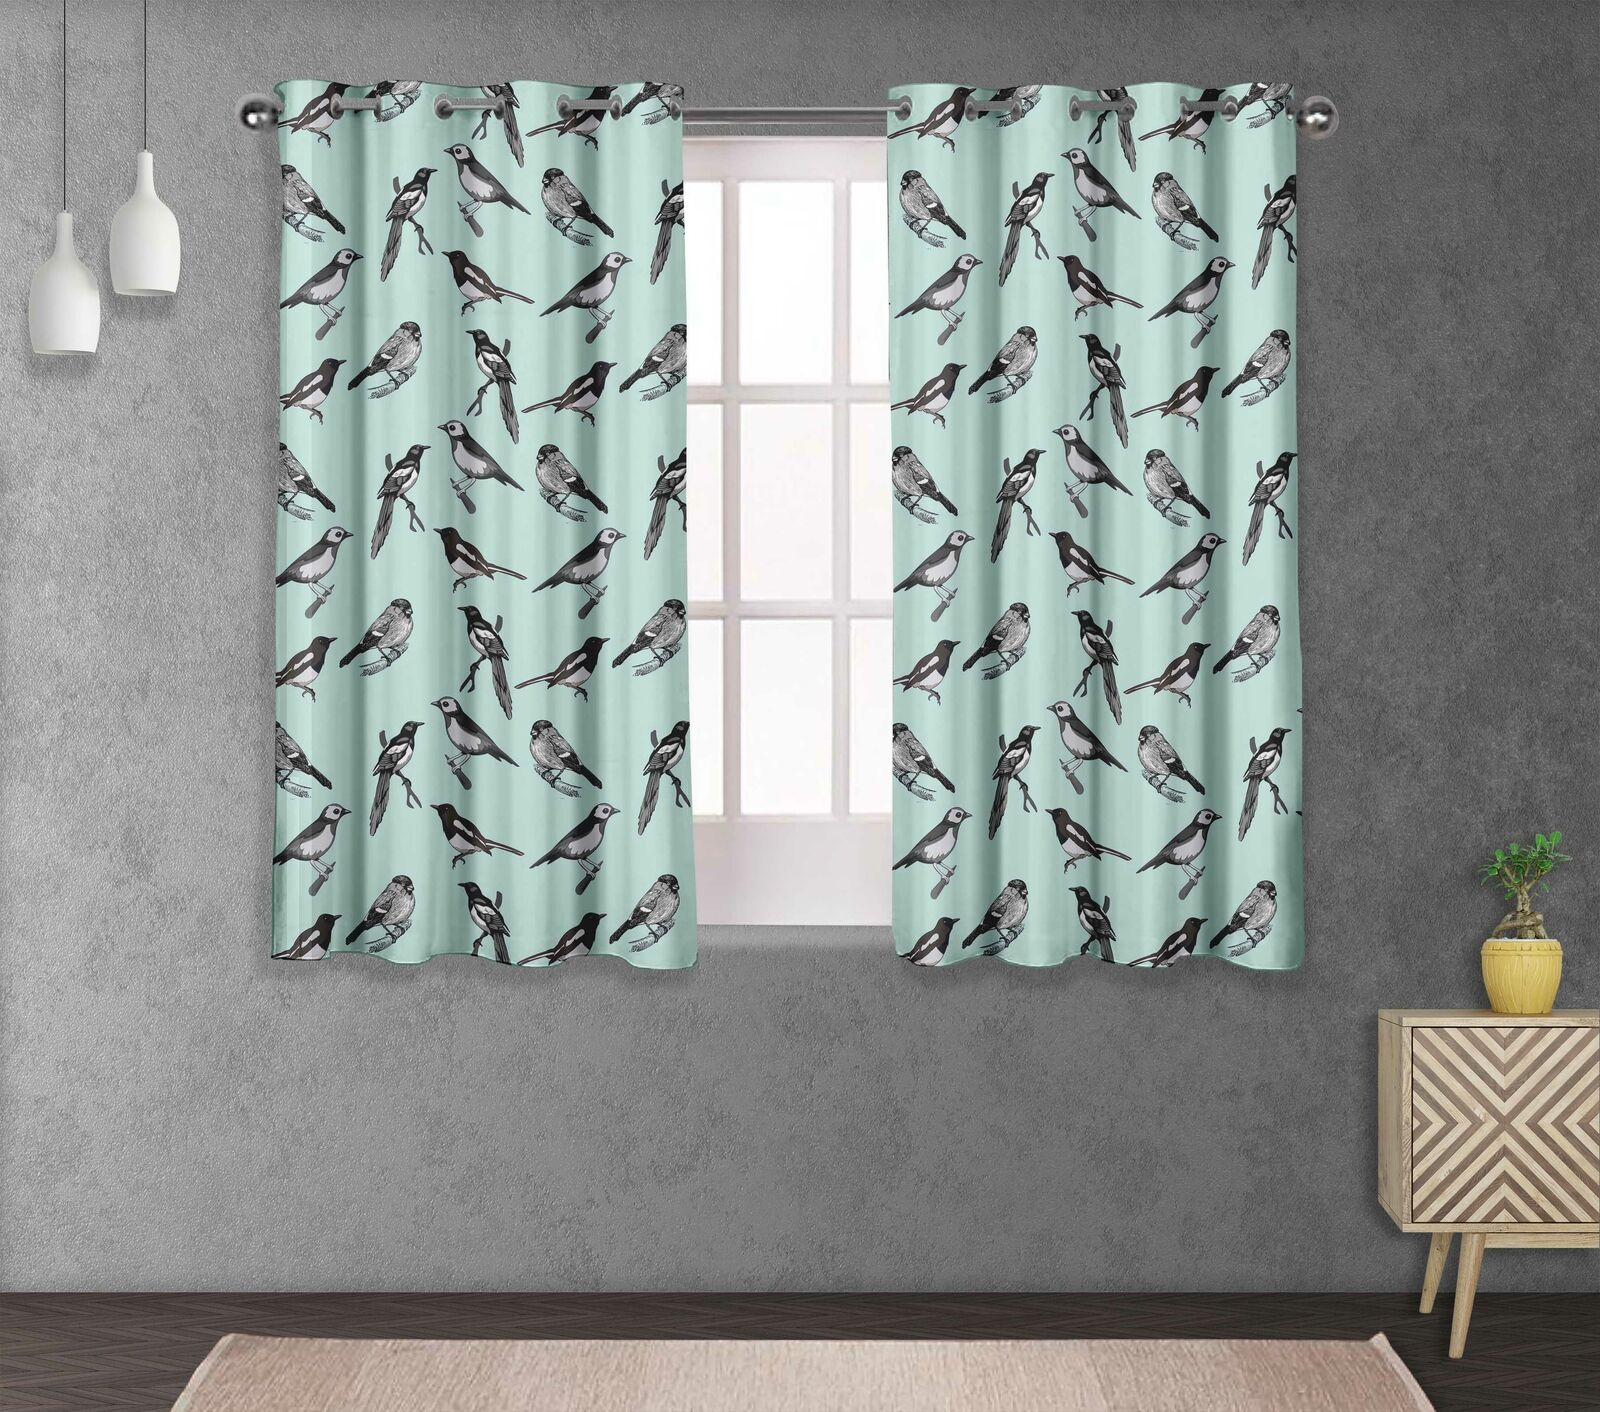 S4sassy Artistic Living Room Eyelet Window short & long Curtain -BRD-532B